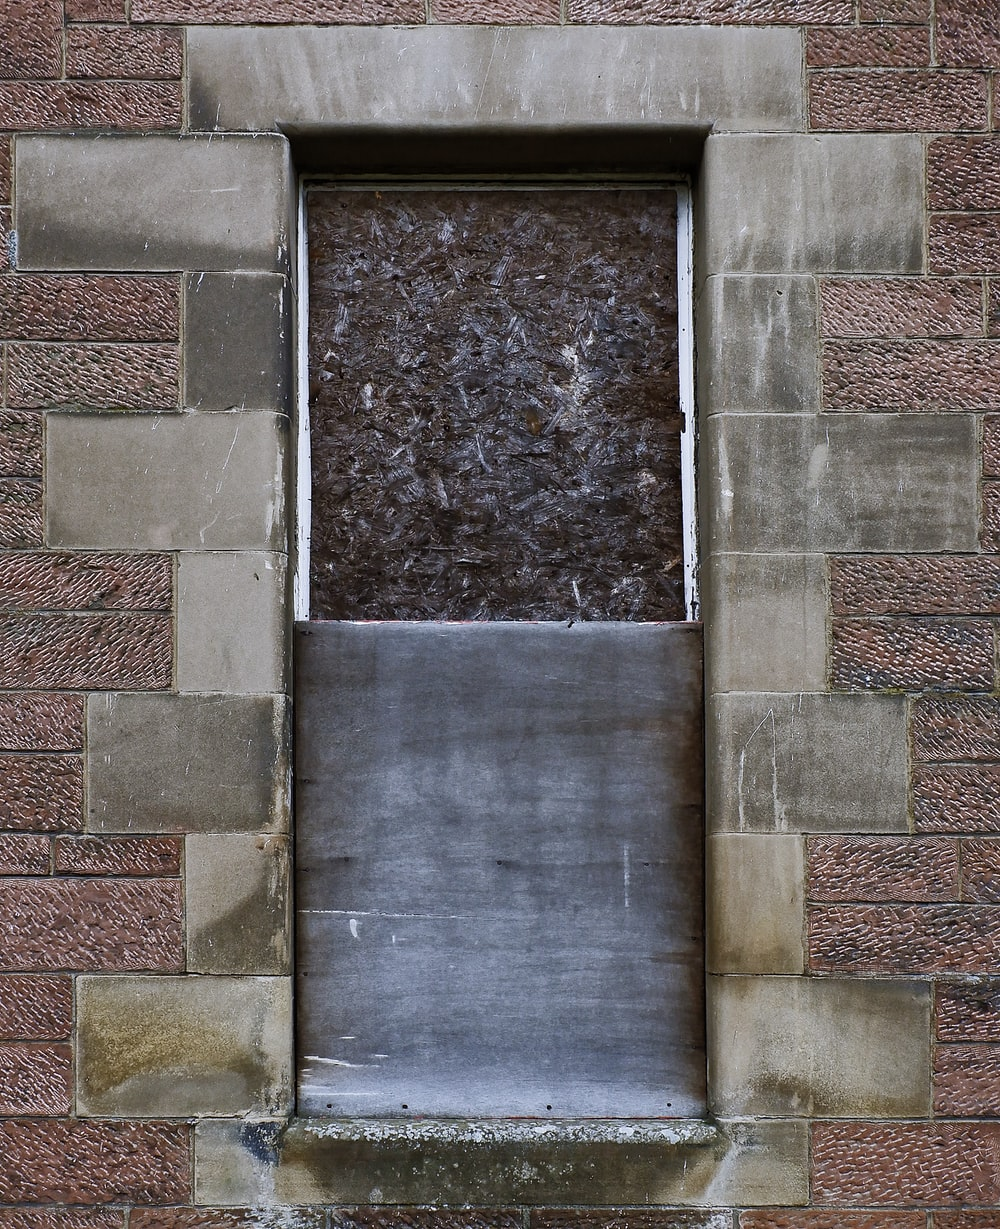 window on brown bricks